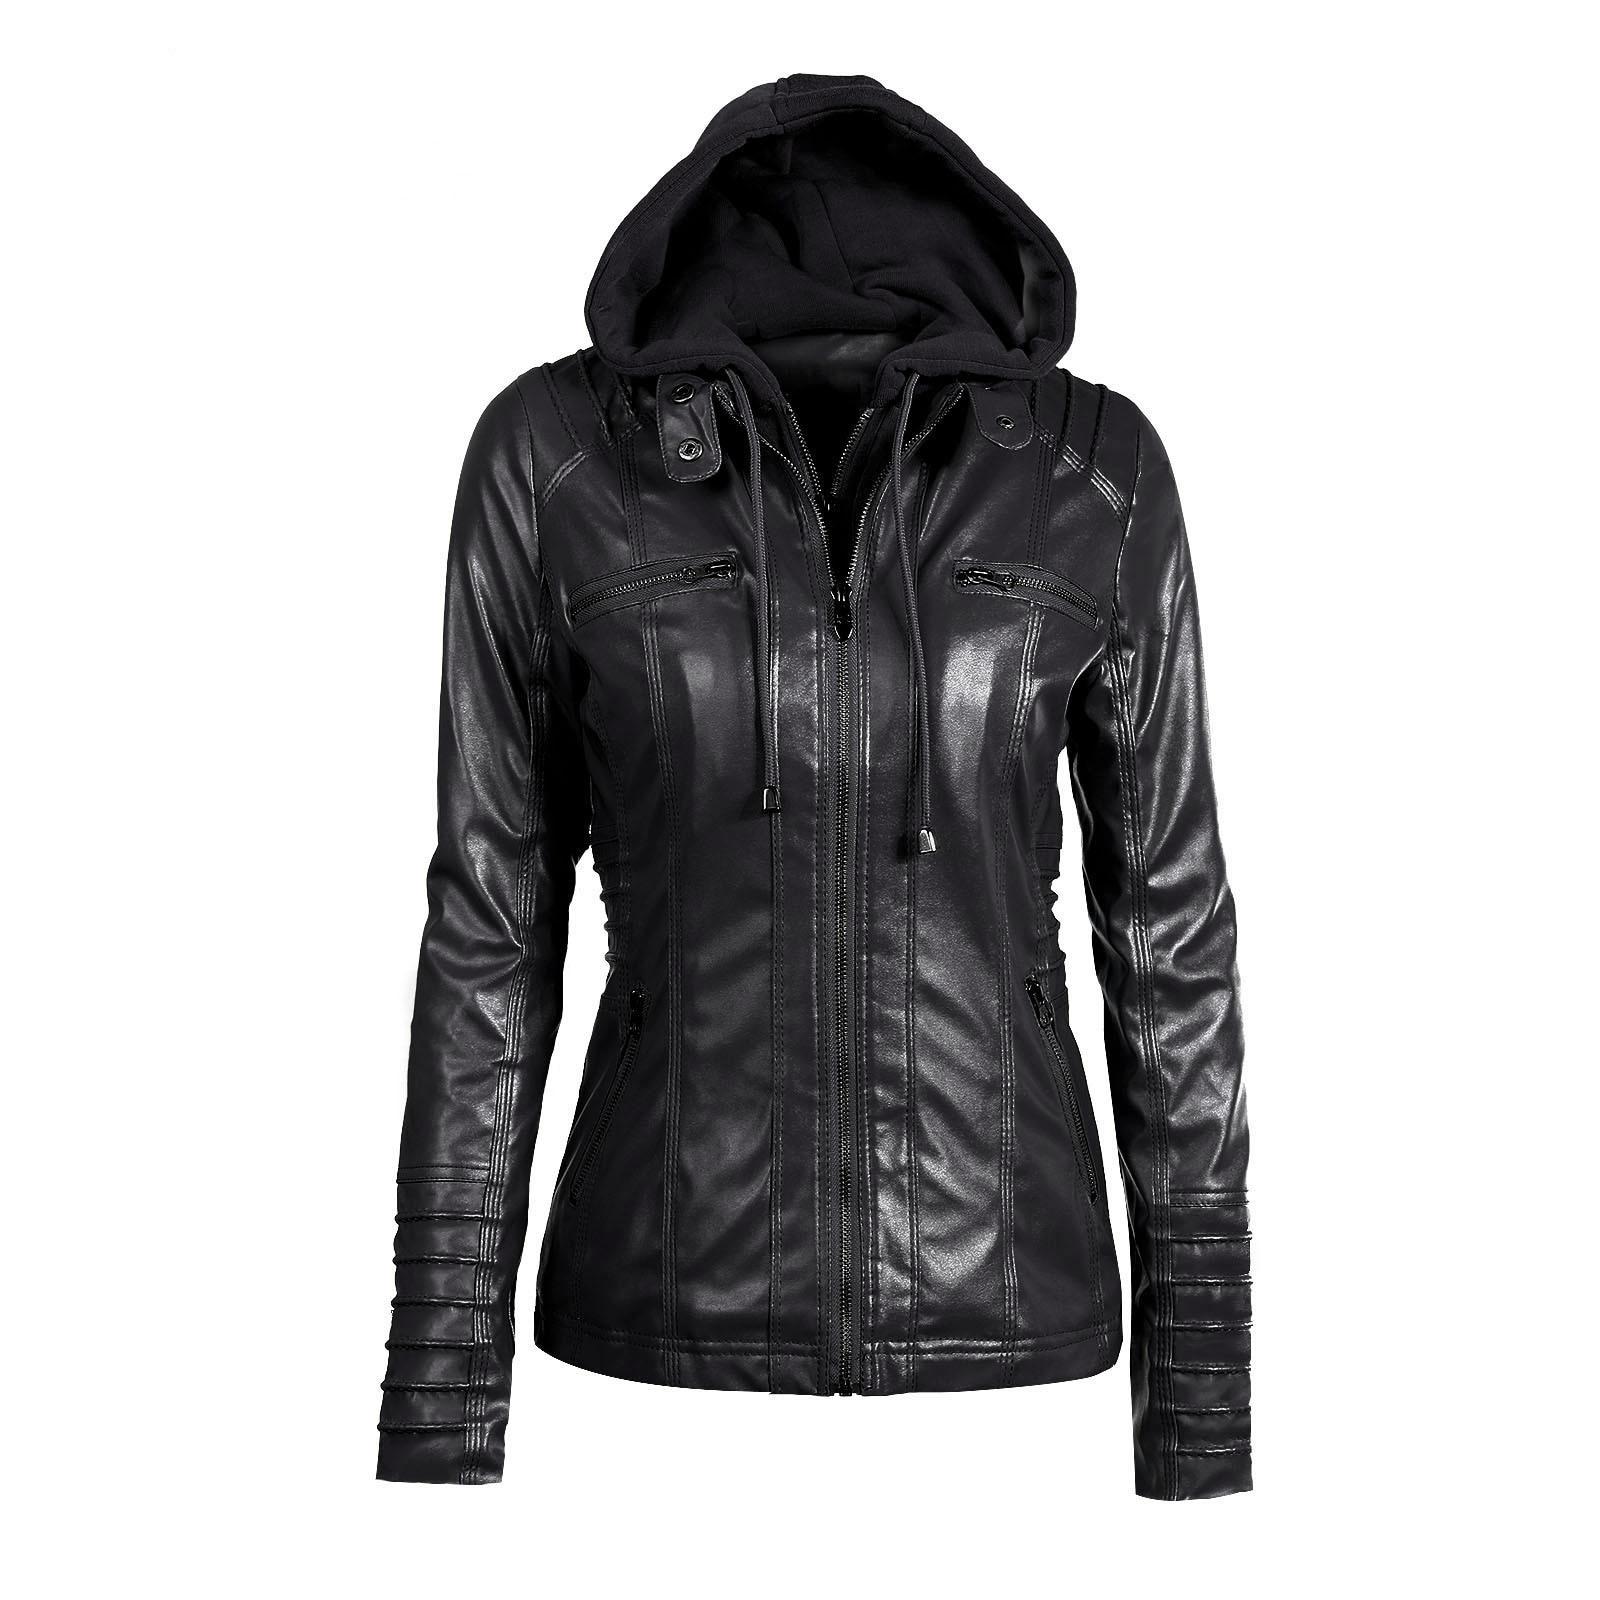 Riverdale Southside Riverdale Serpents black Brown PU Leather Jacket Women Riverdale Serpents Streetwear Leather Brand Coat 18